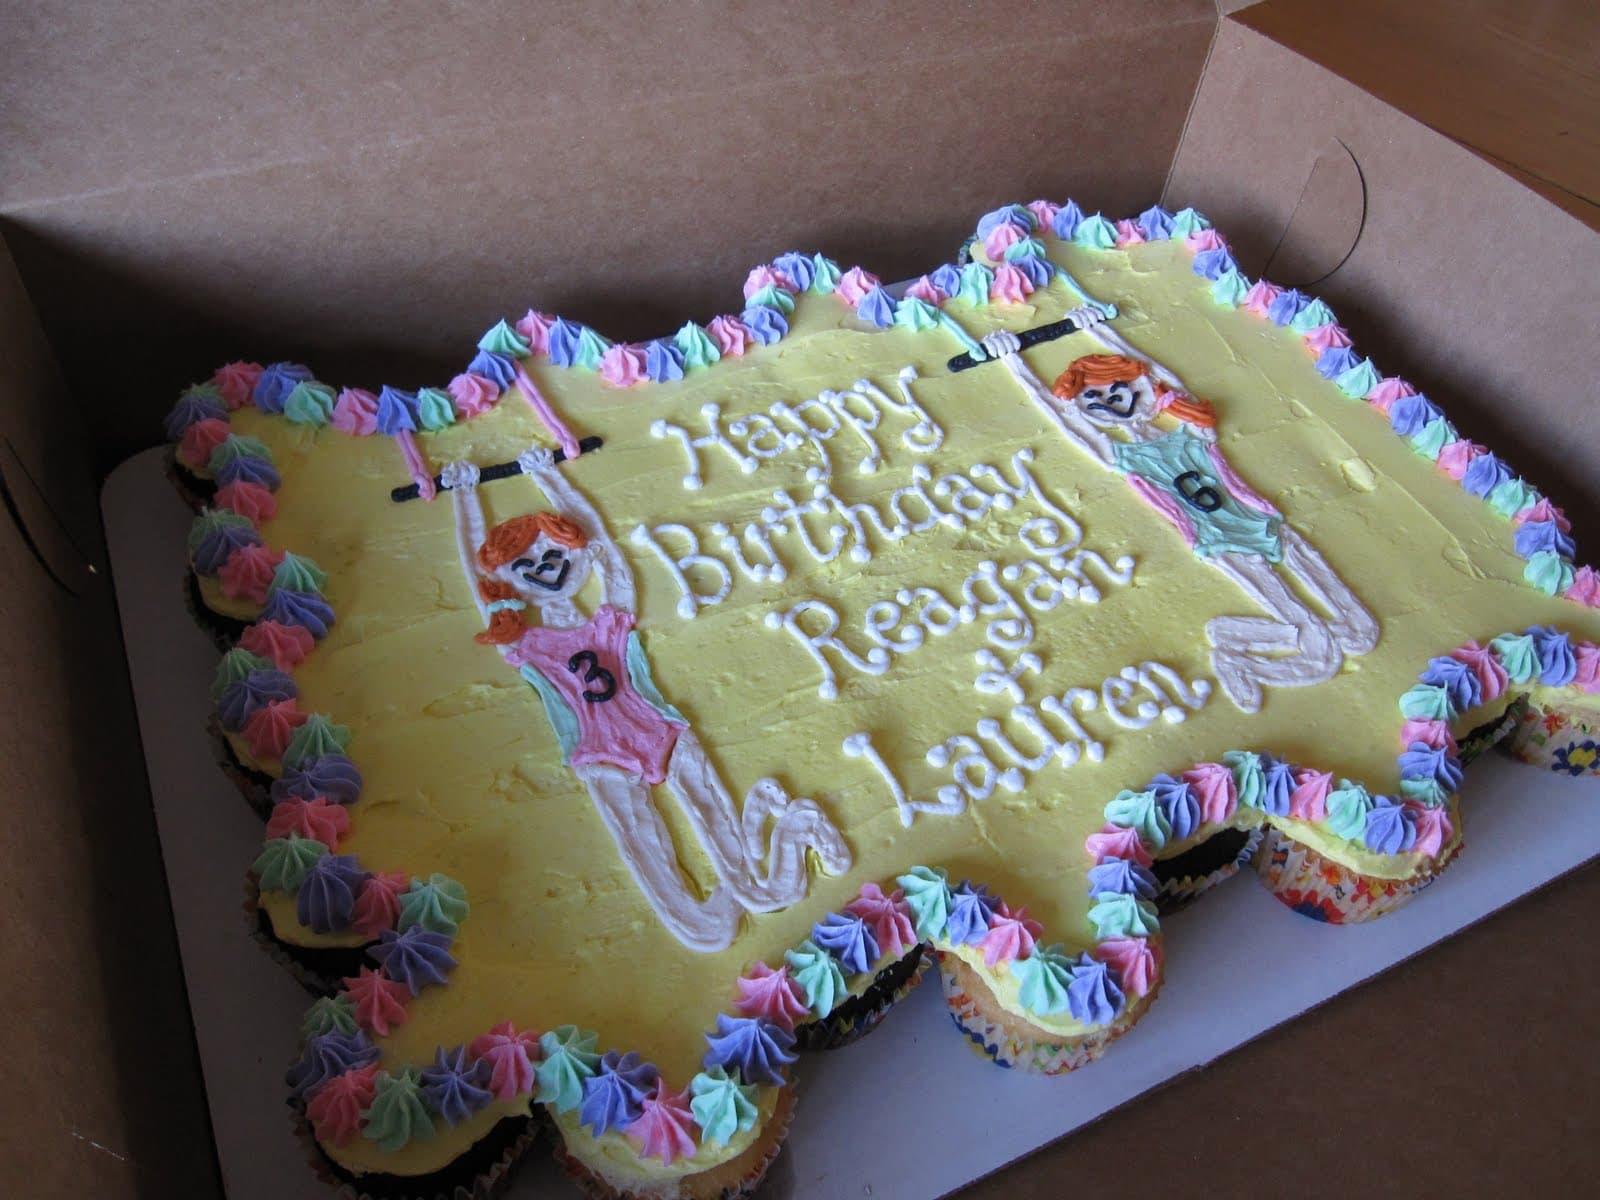 Gymnastics-decorated birthday sheet cake in a box